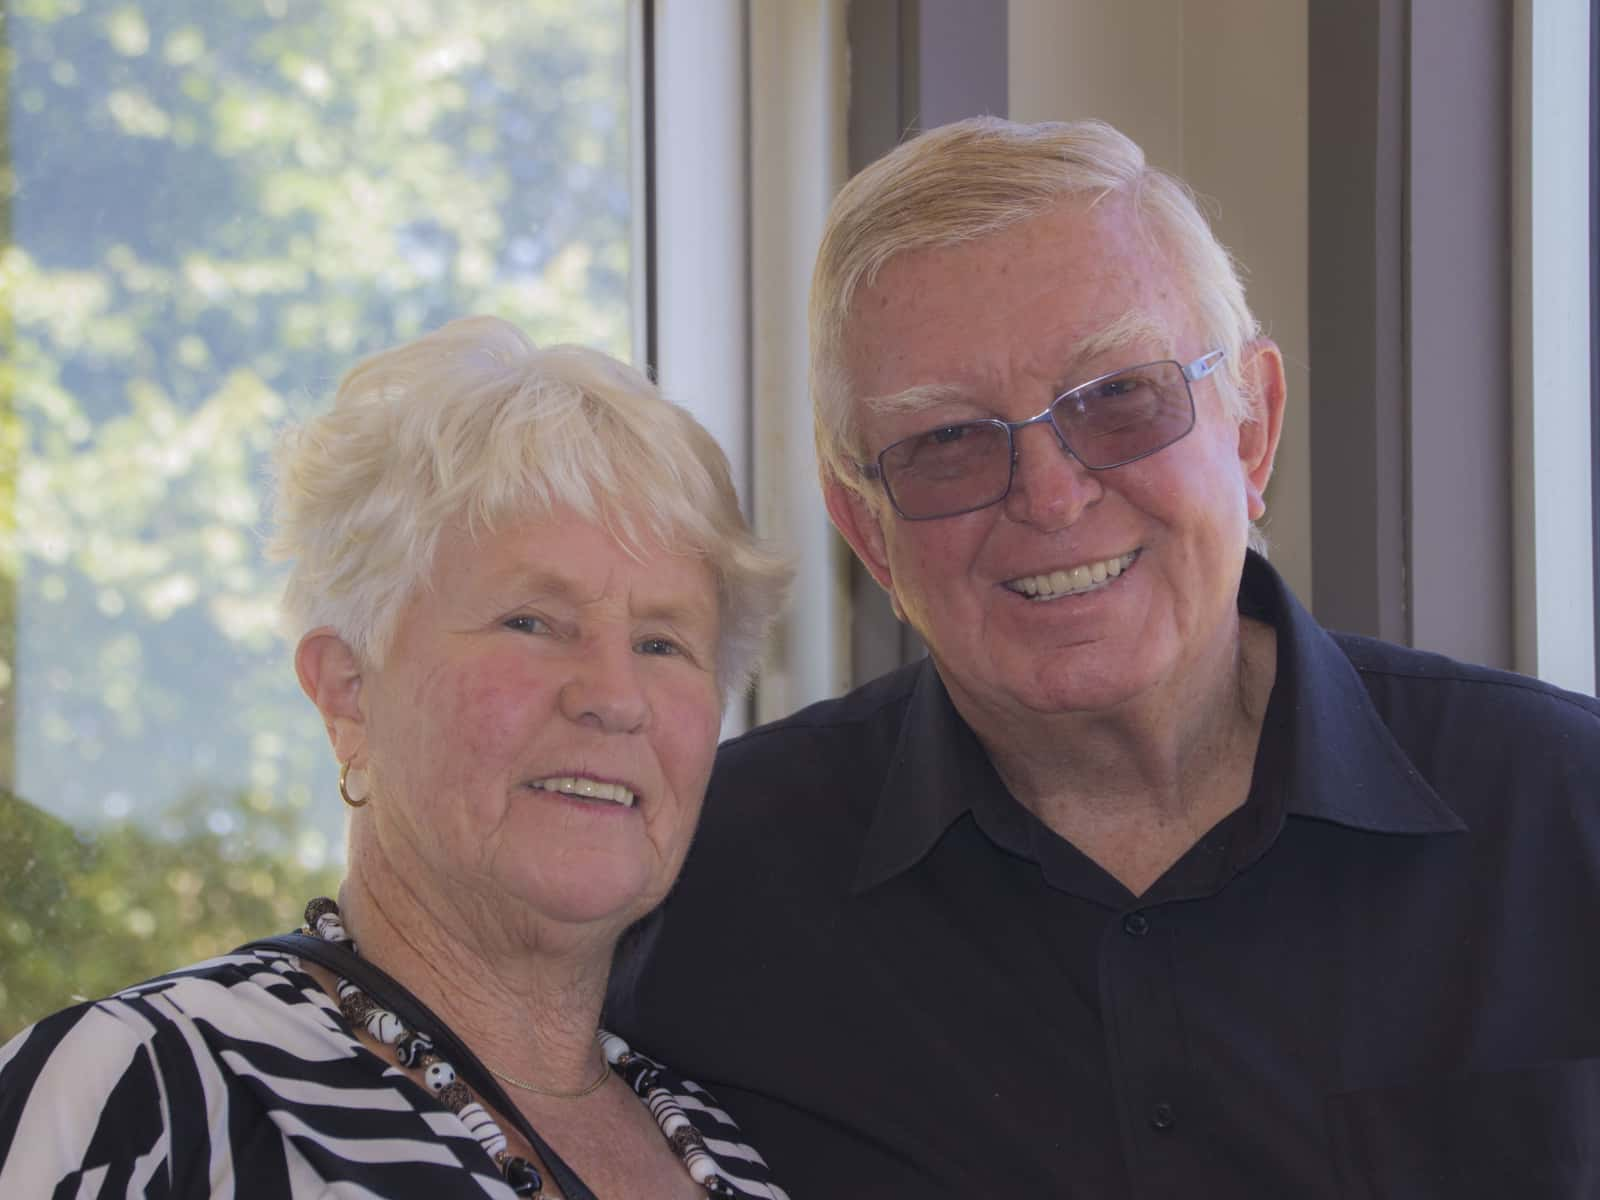 Graeme & Thelma from Kilcunda, Victoria, Australia